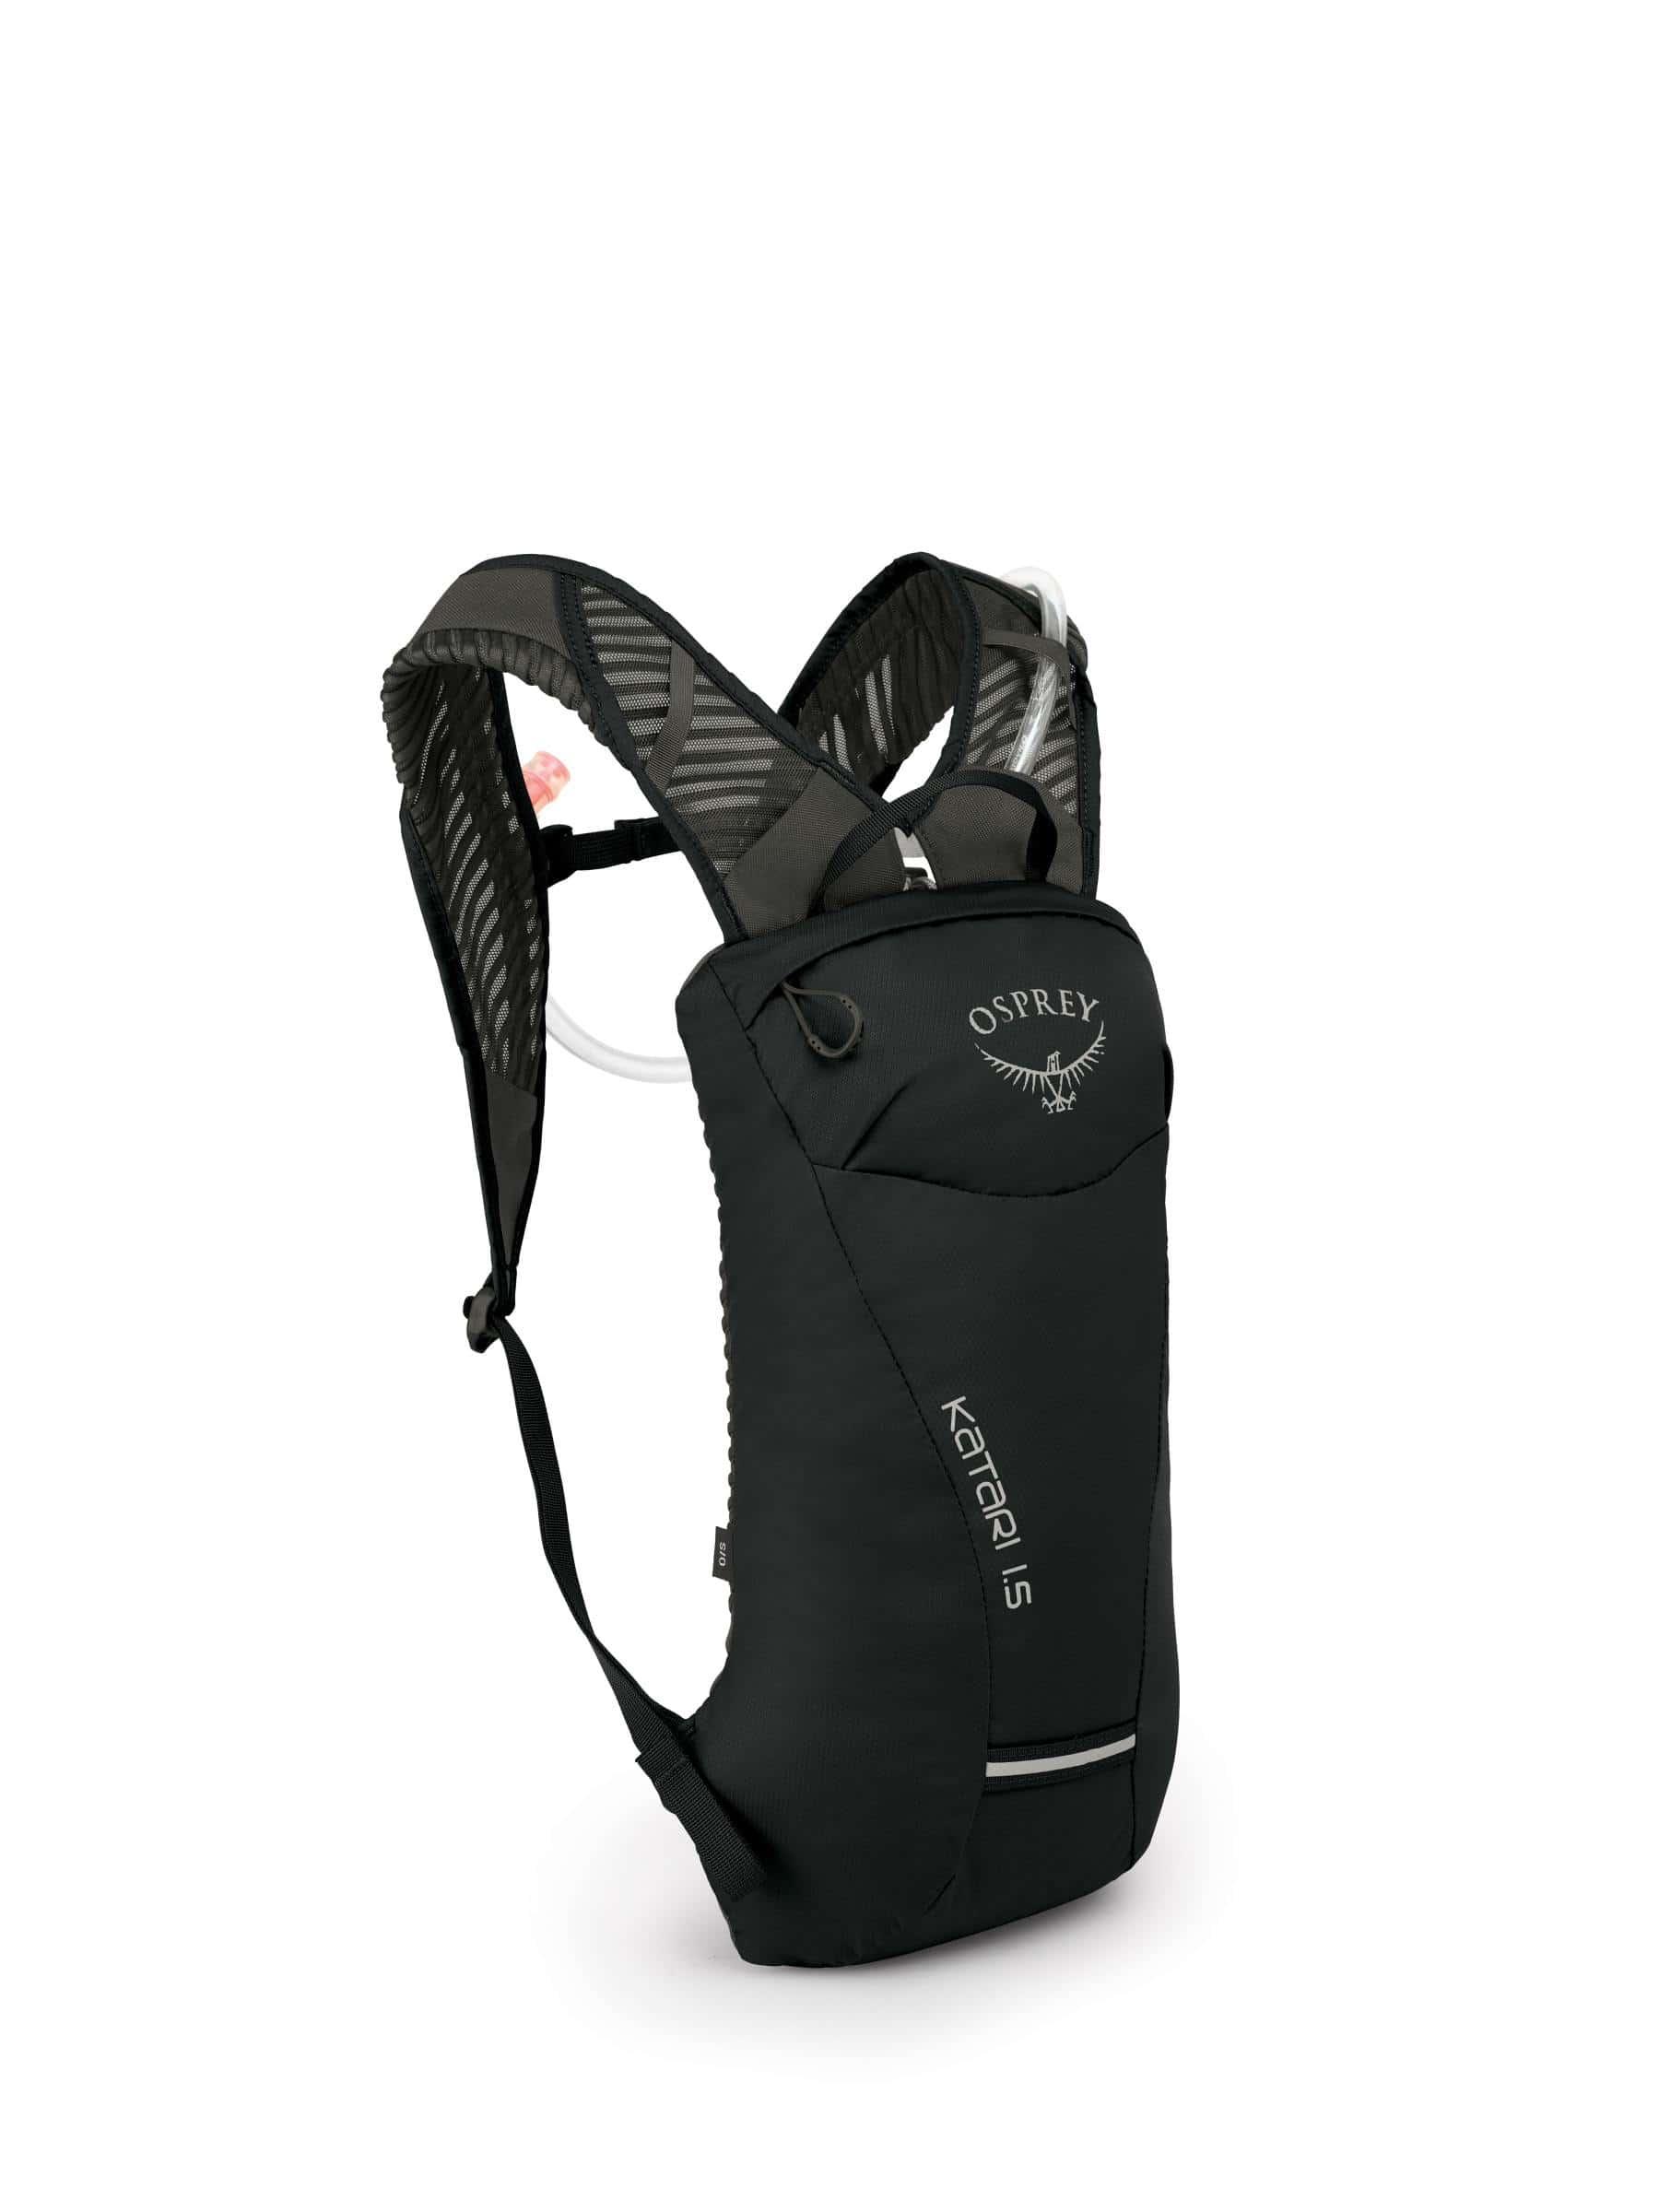 Osprey-Katari 1.5 - Men's